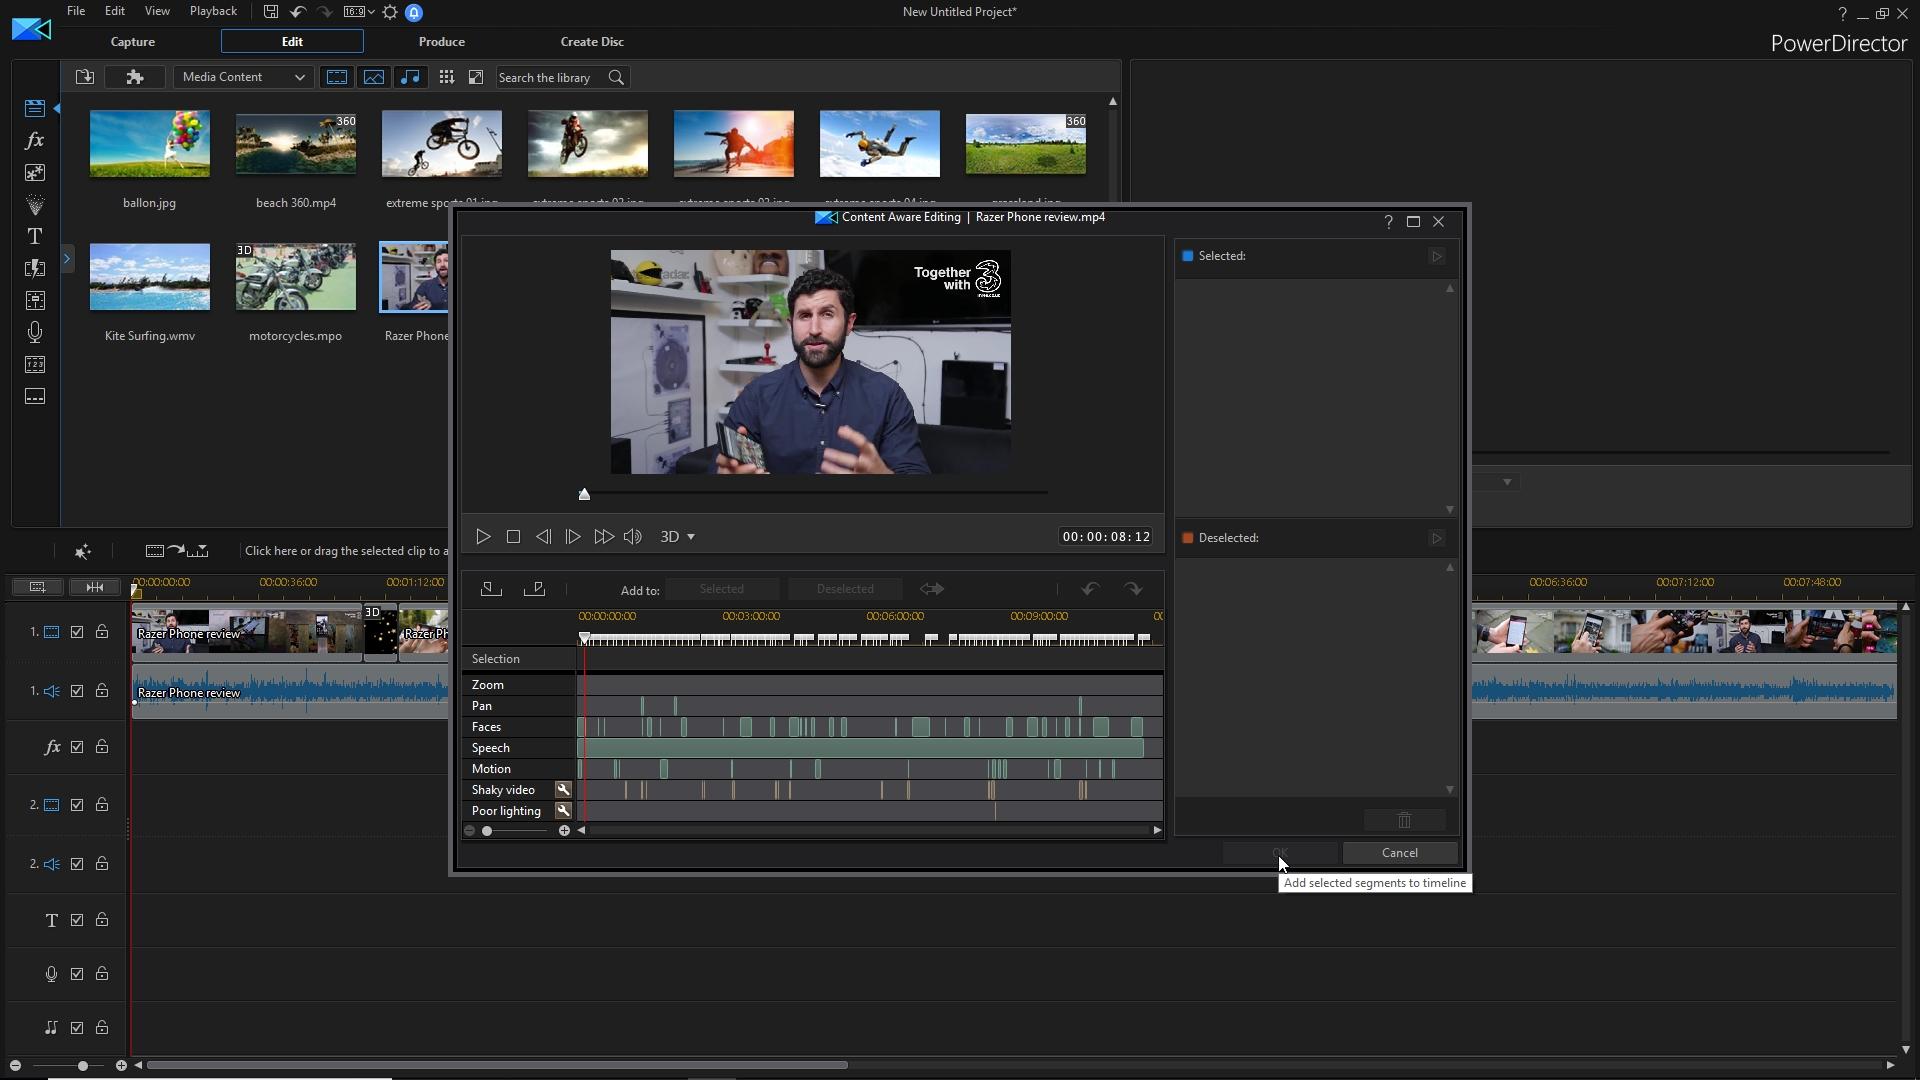 PowerDirector 16 content-aware editing